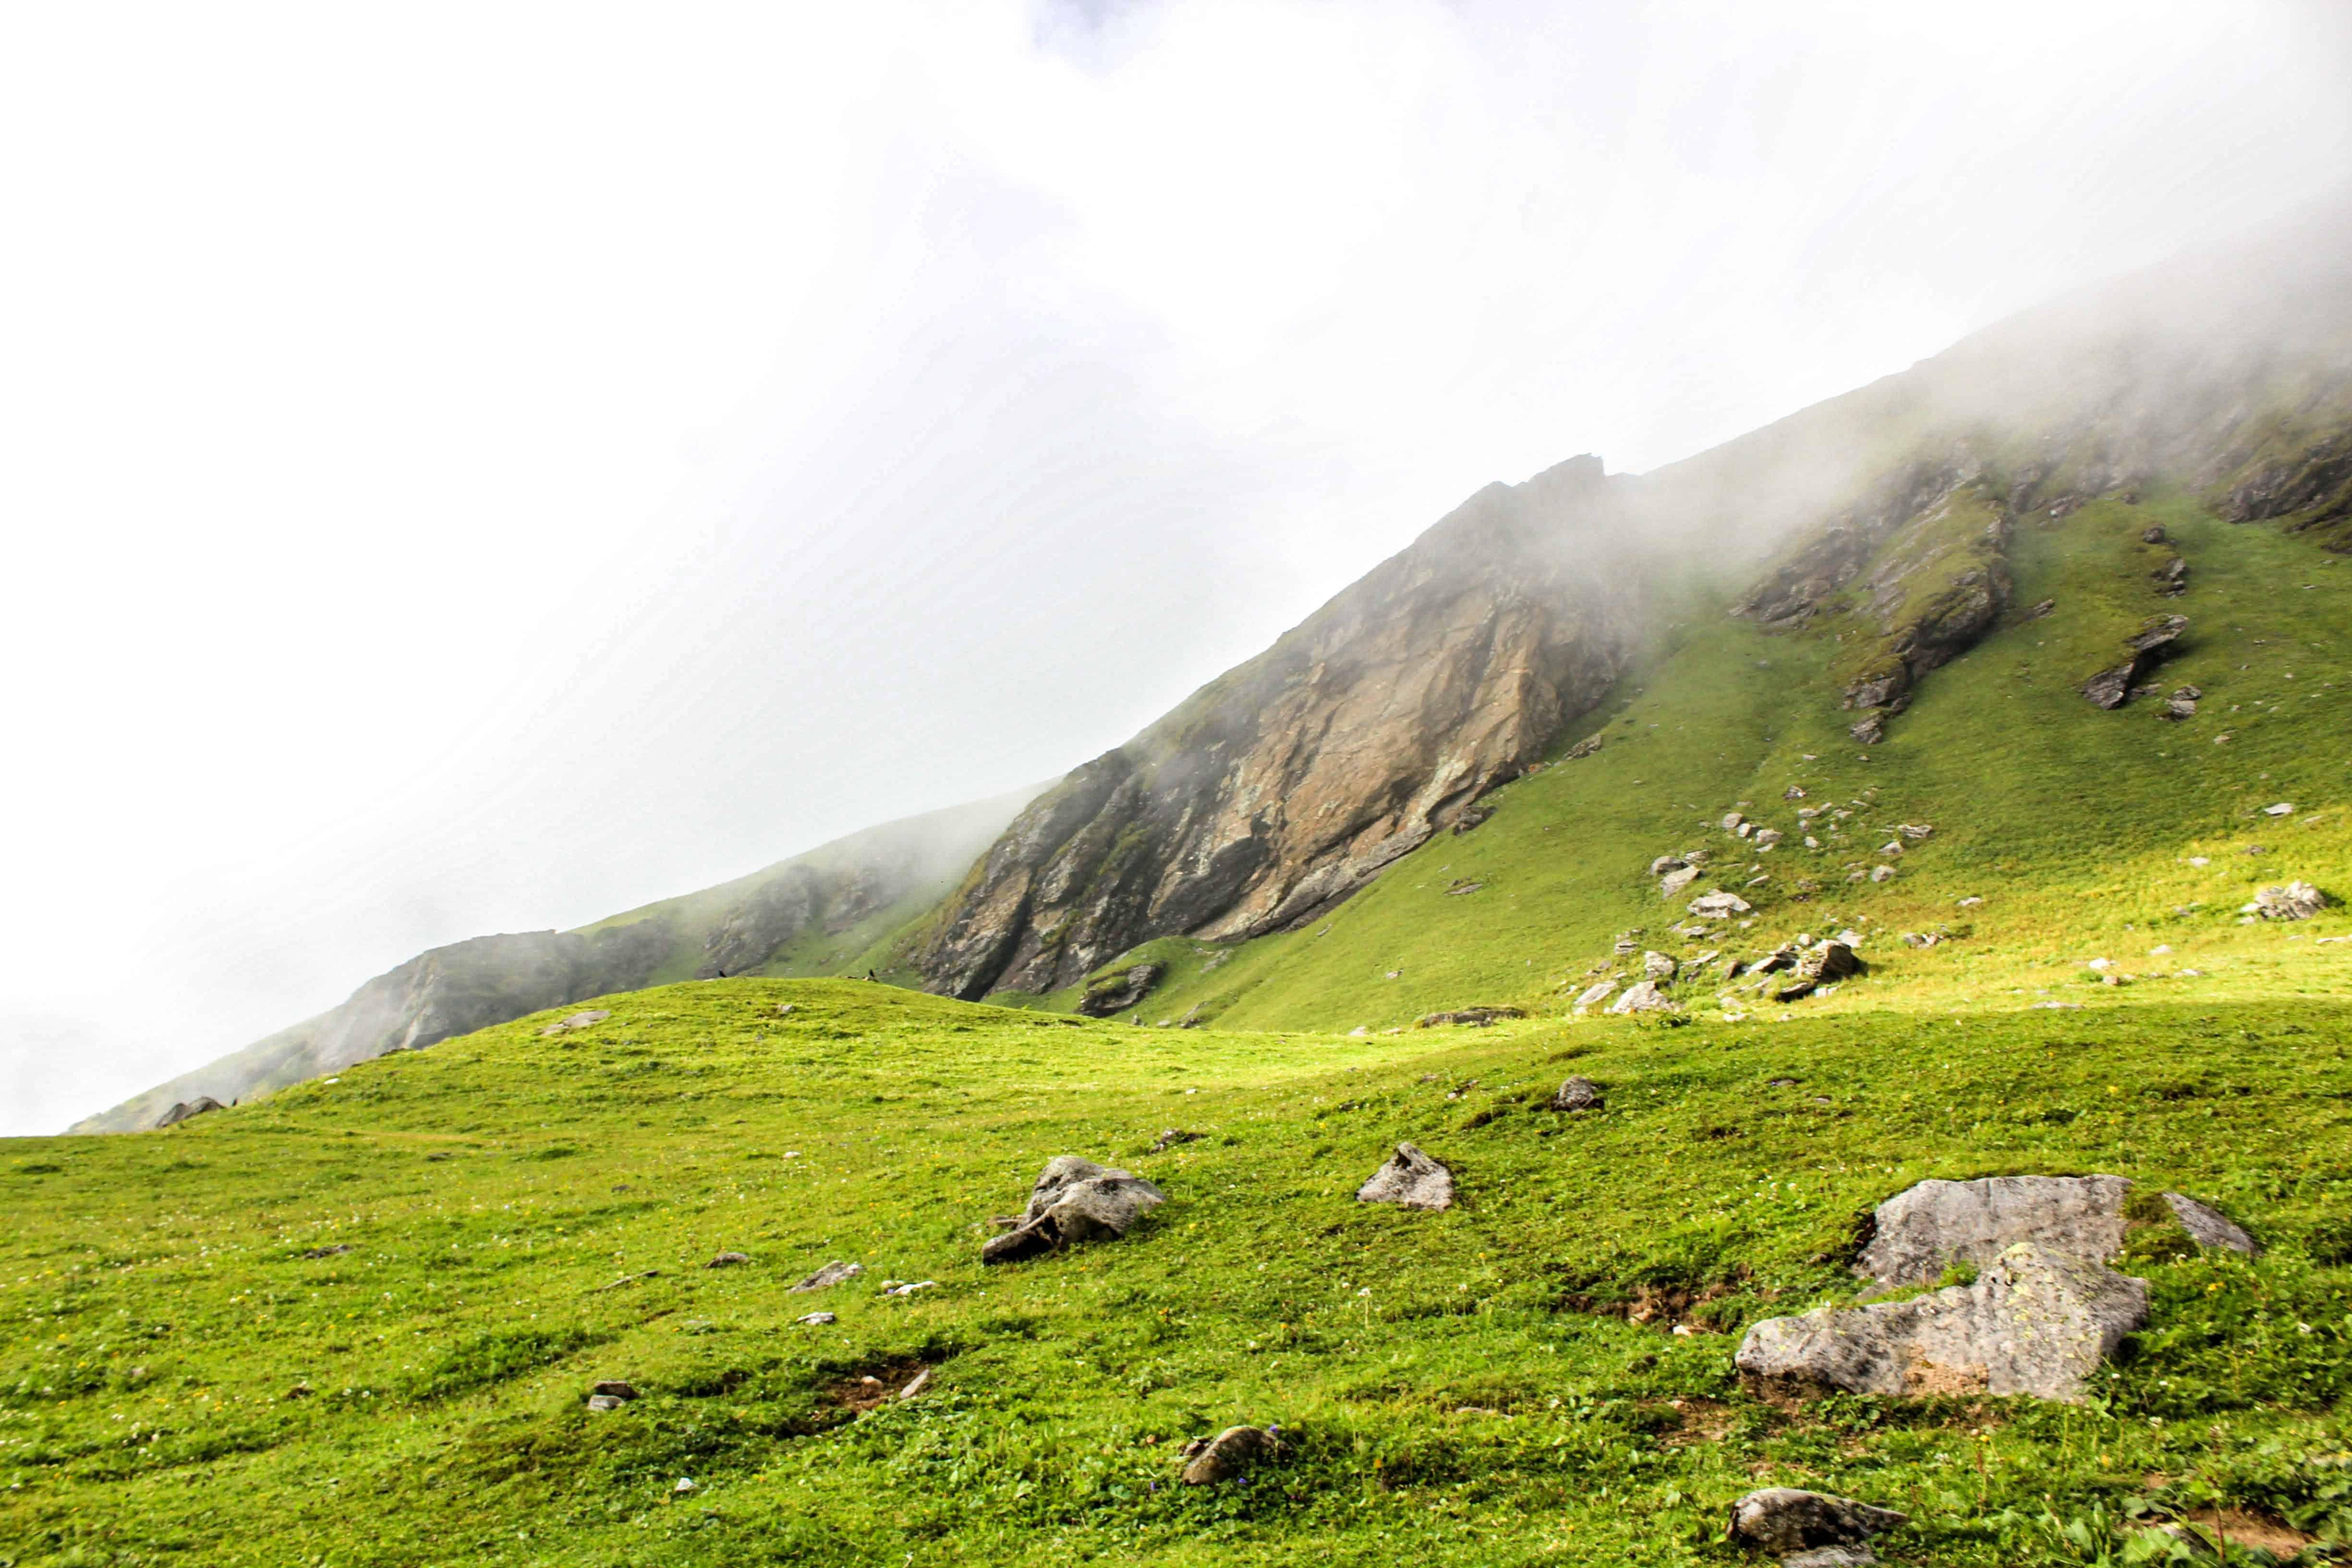 Landscape around Rola Khuli campsite